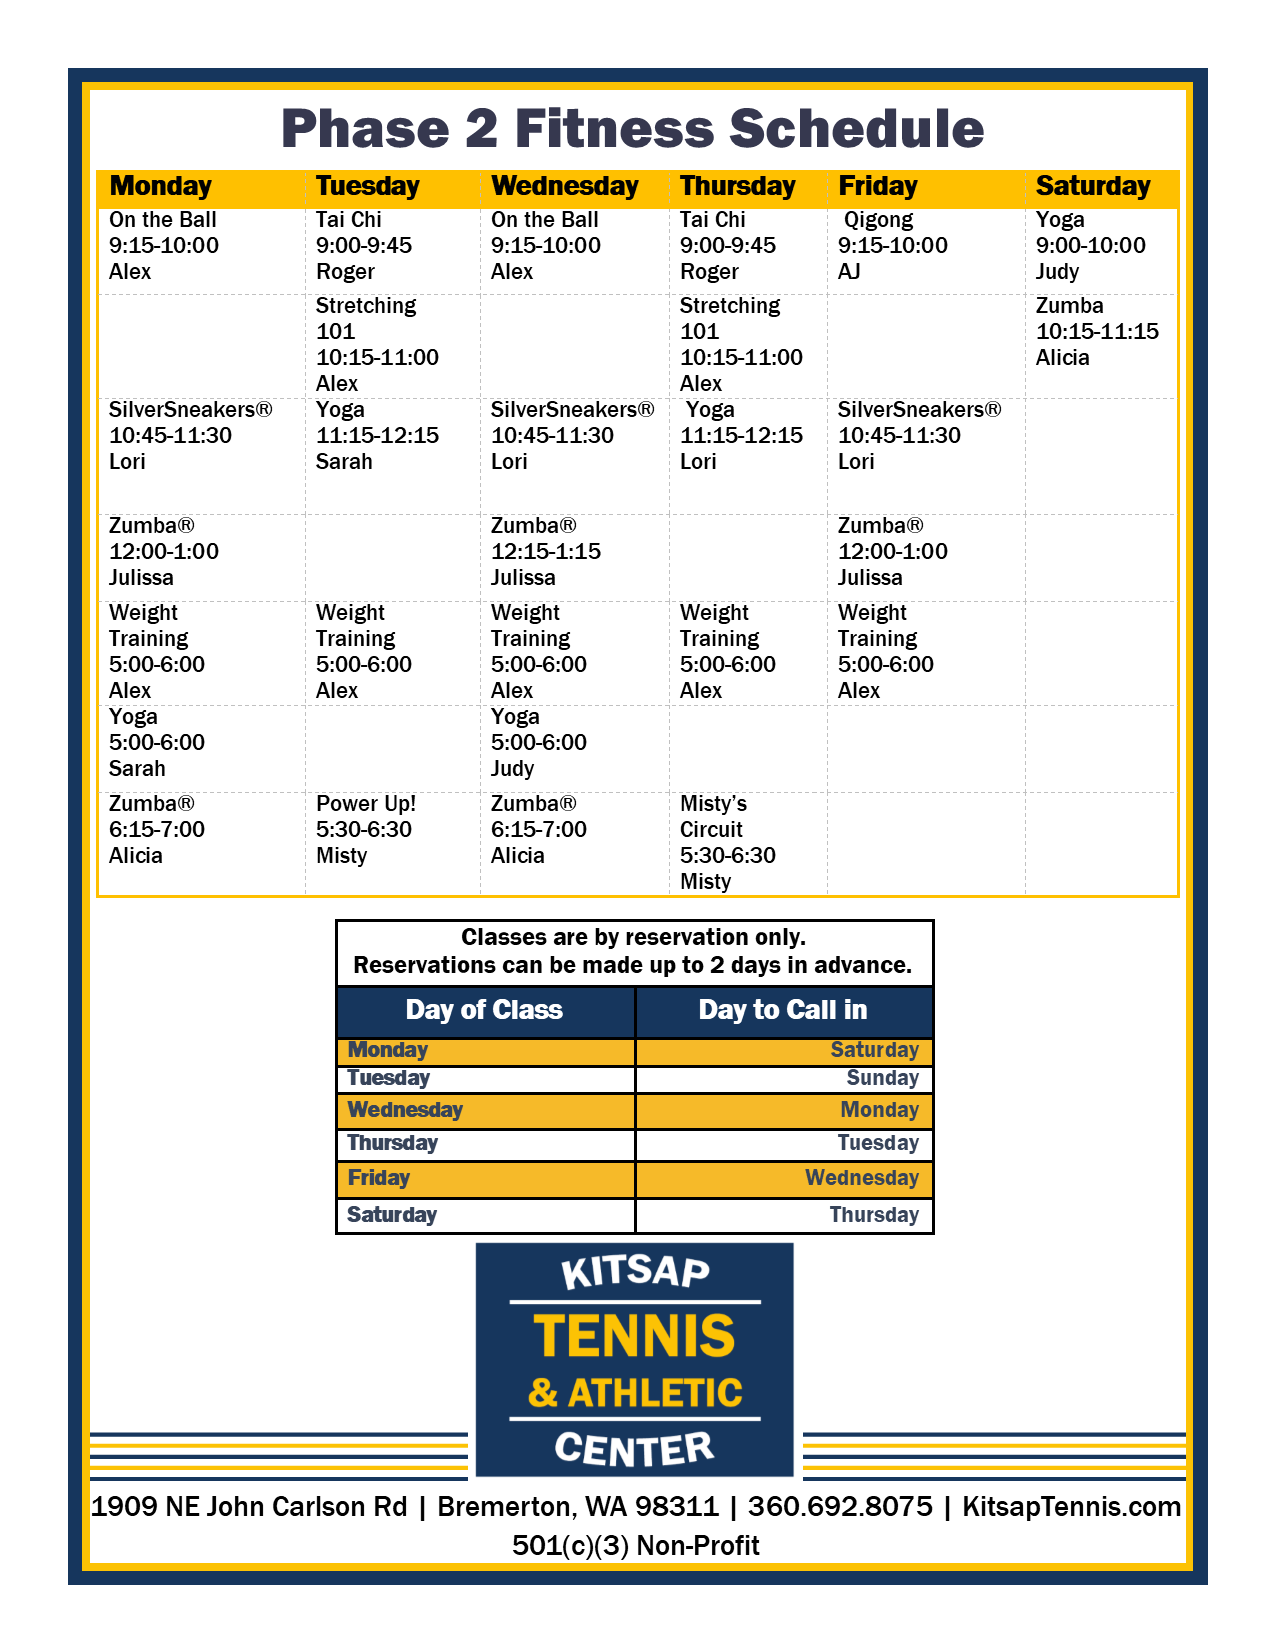 Kitsap Tennis Phase 2 Fitness Schedule